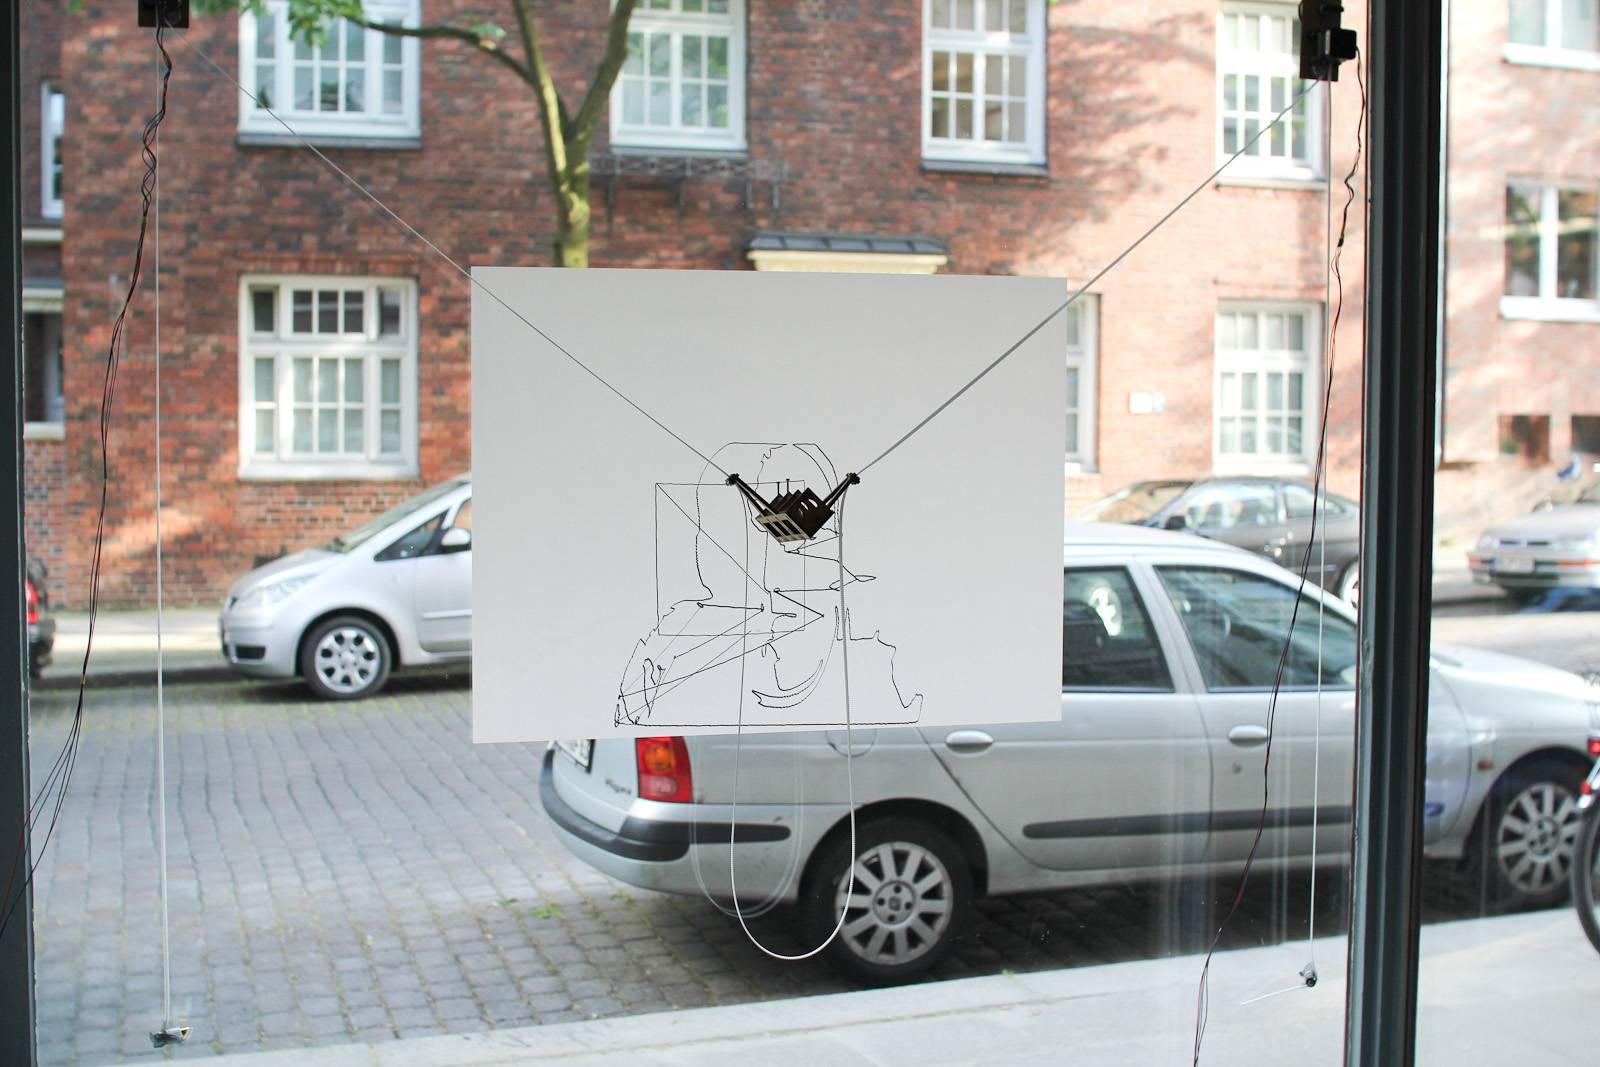 der kritzler la machine qui dessine sur les vitres semageek. Black Bedroom Furniture Sets. Home Design Ideas